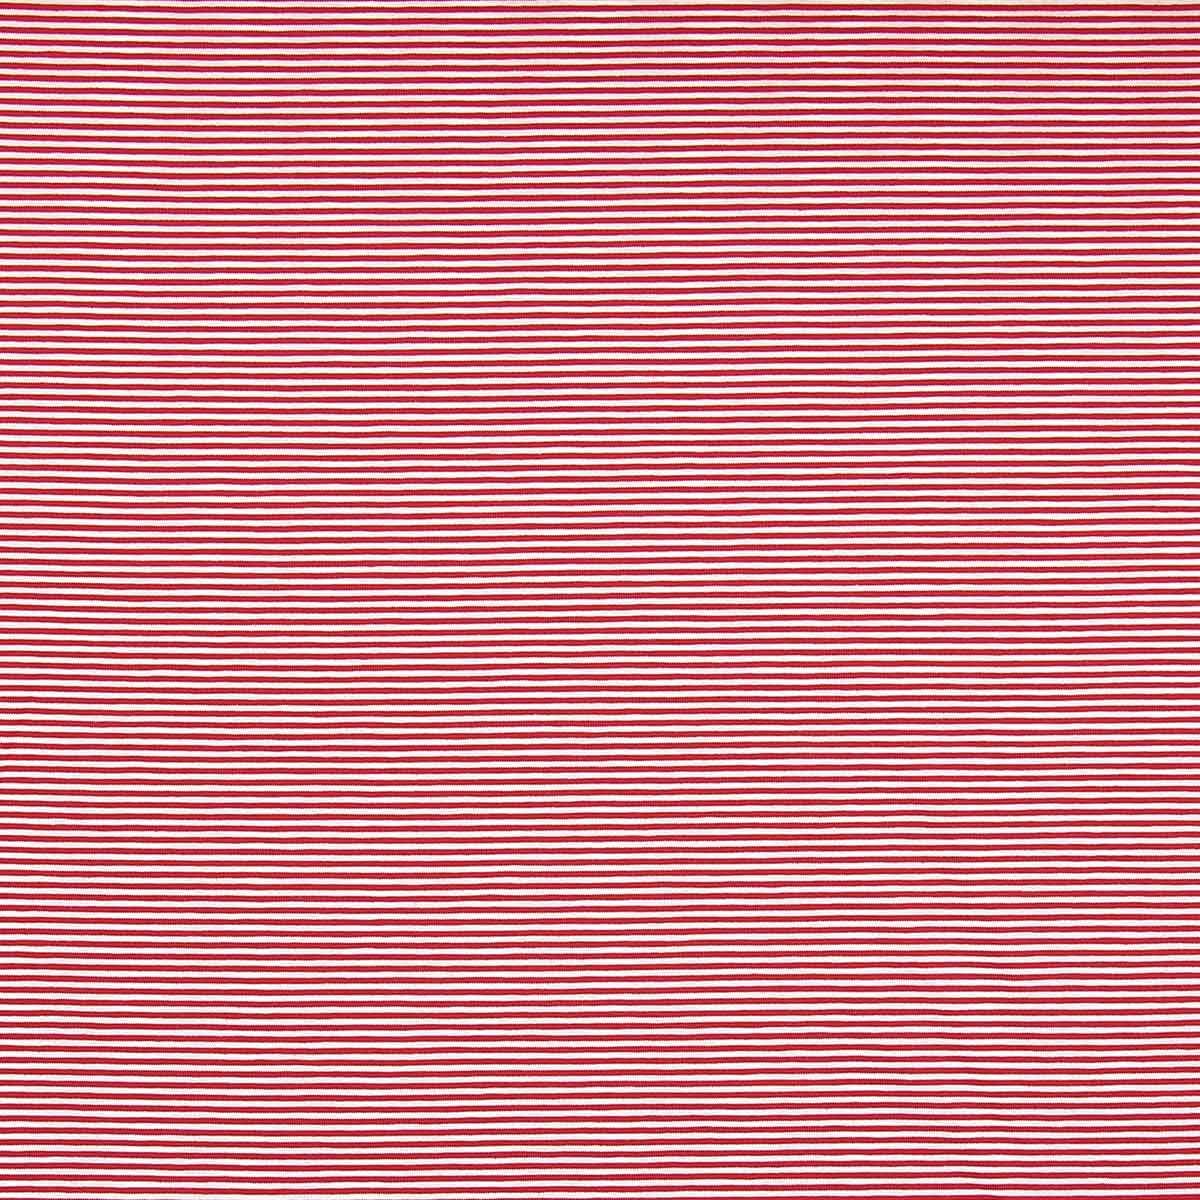 Tissu jersey marinière - Rayures fines rouges